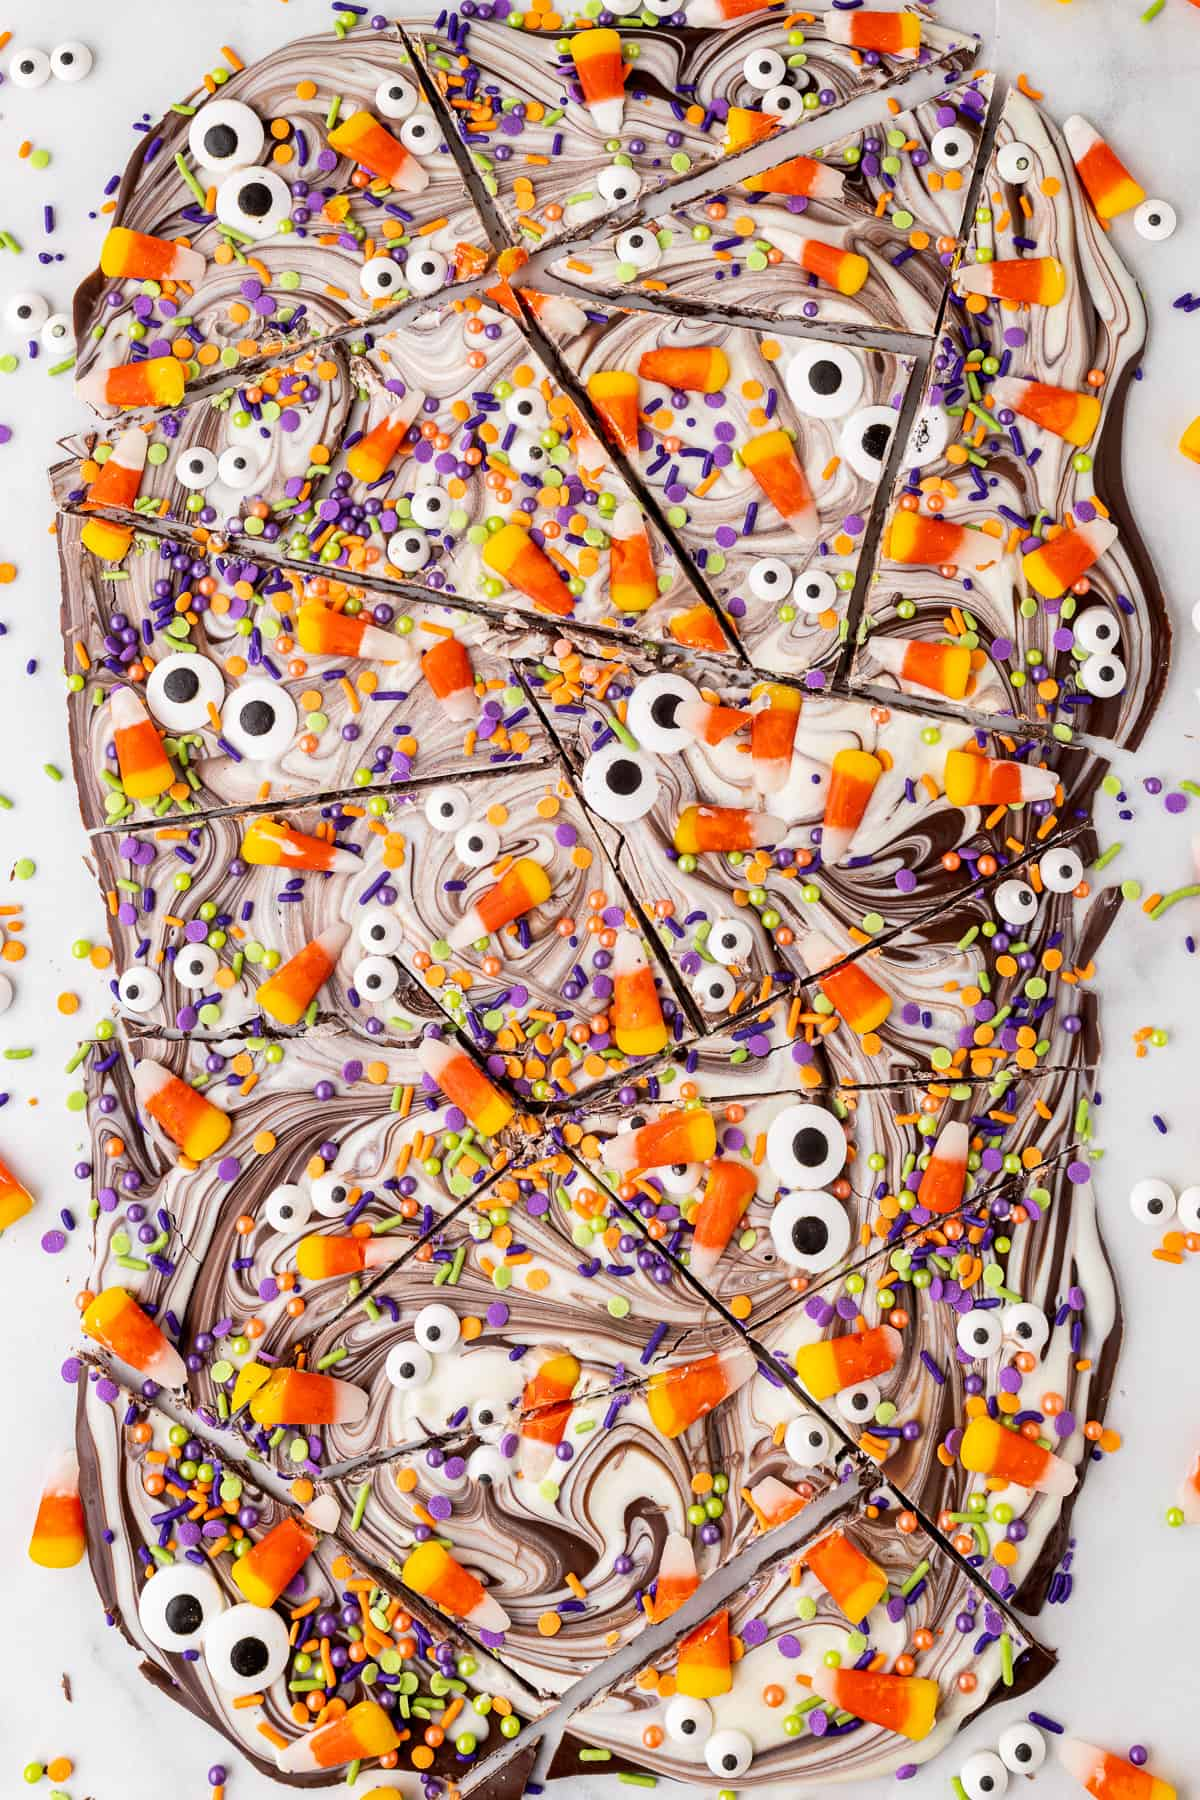 halloween chocolate bark with monster eyes broken apart